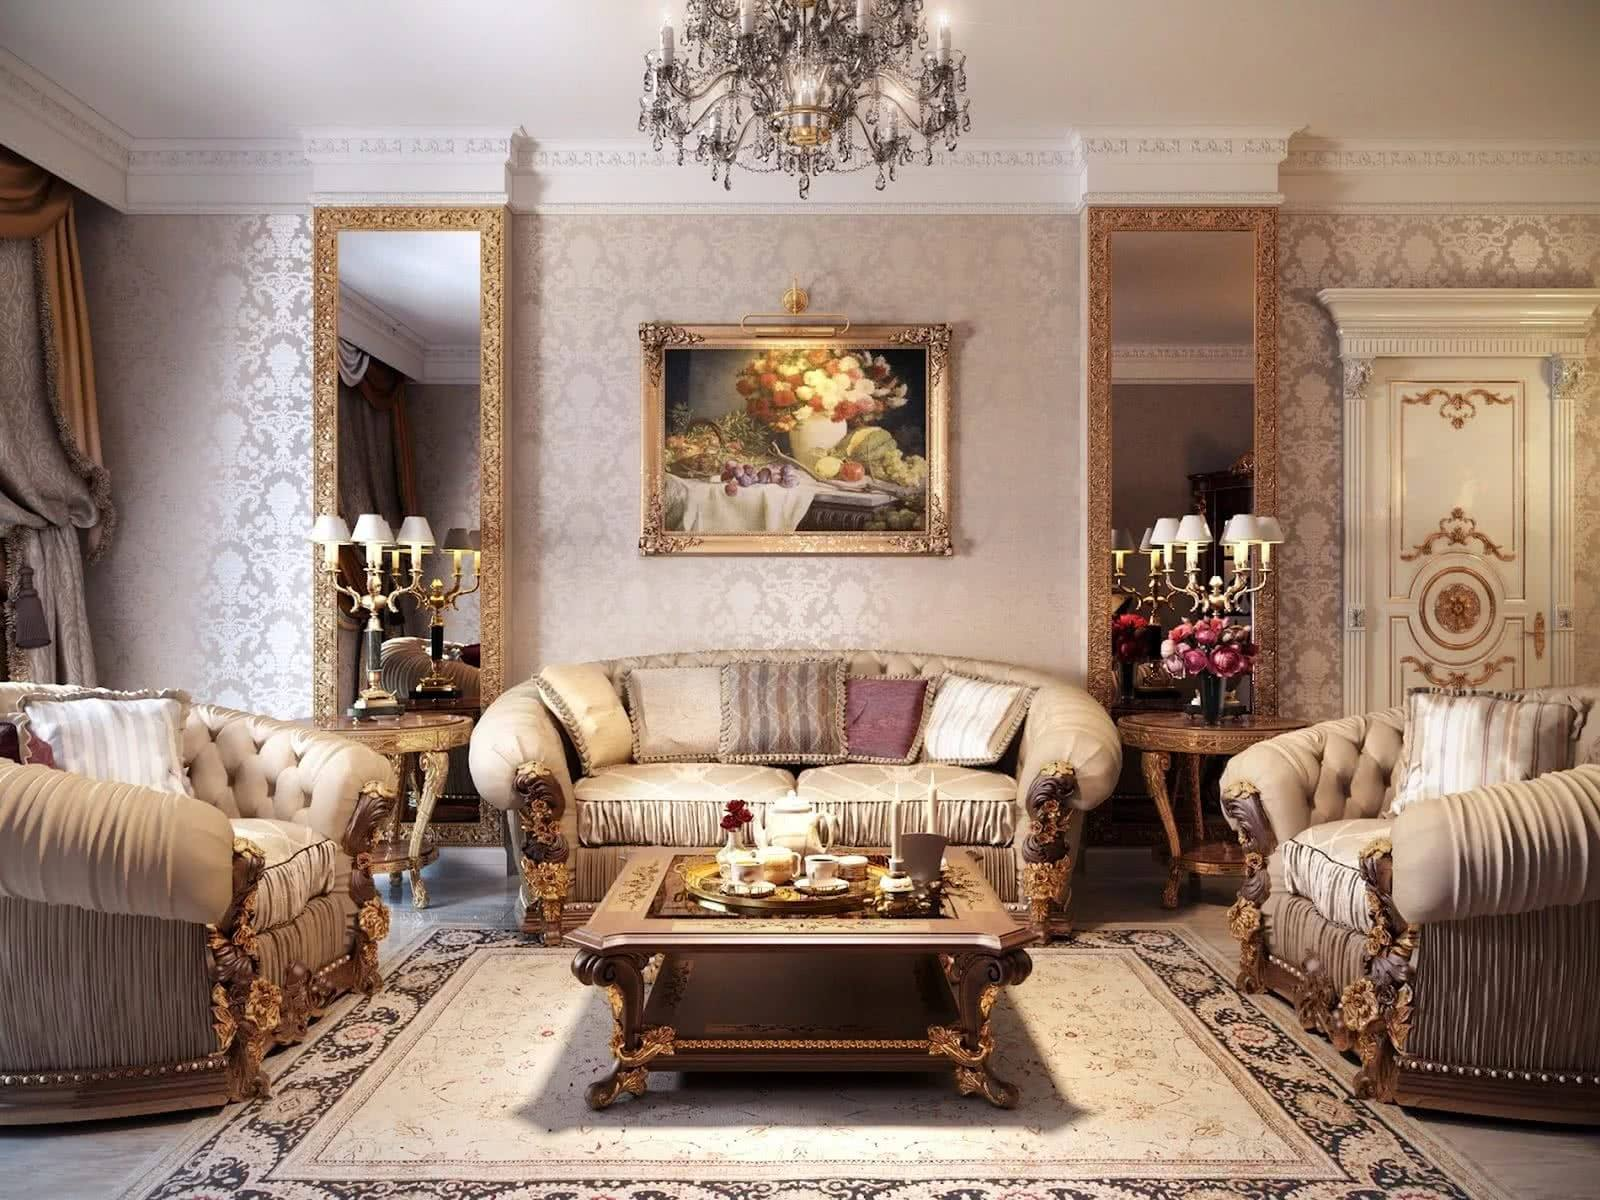 Fretwork, moldings and voluminous upholstered furniture